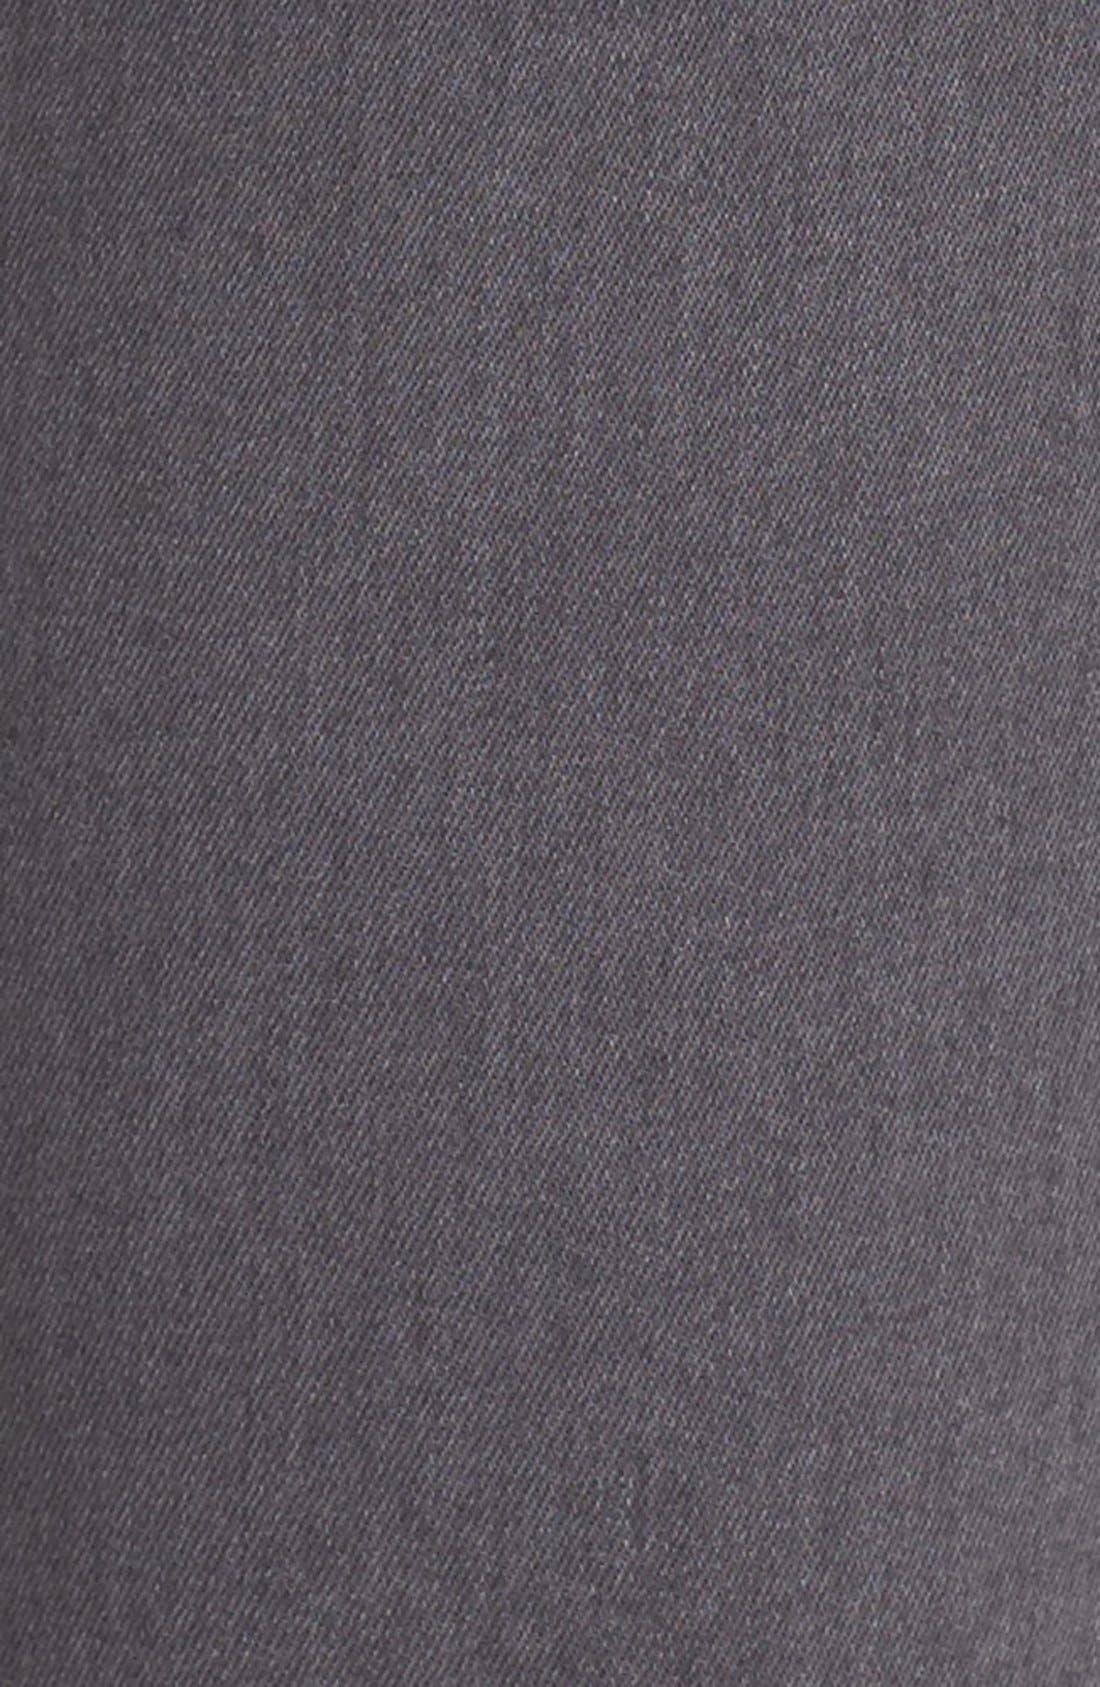 Alternate Image 5  - rag & bone/JEAN RBW23 Zip Detail Skinny Jeans (Seattle)